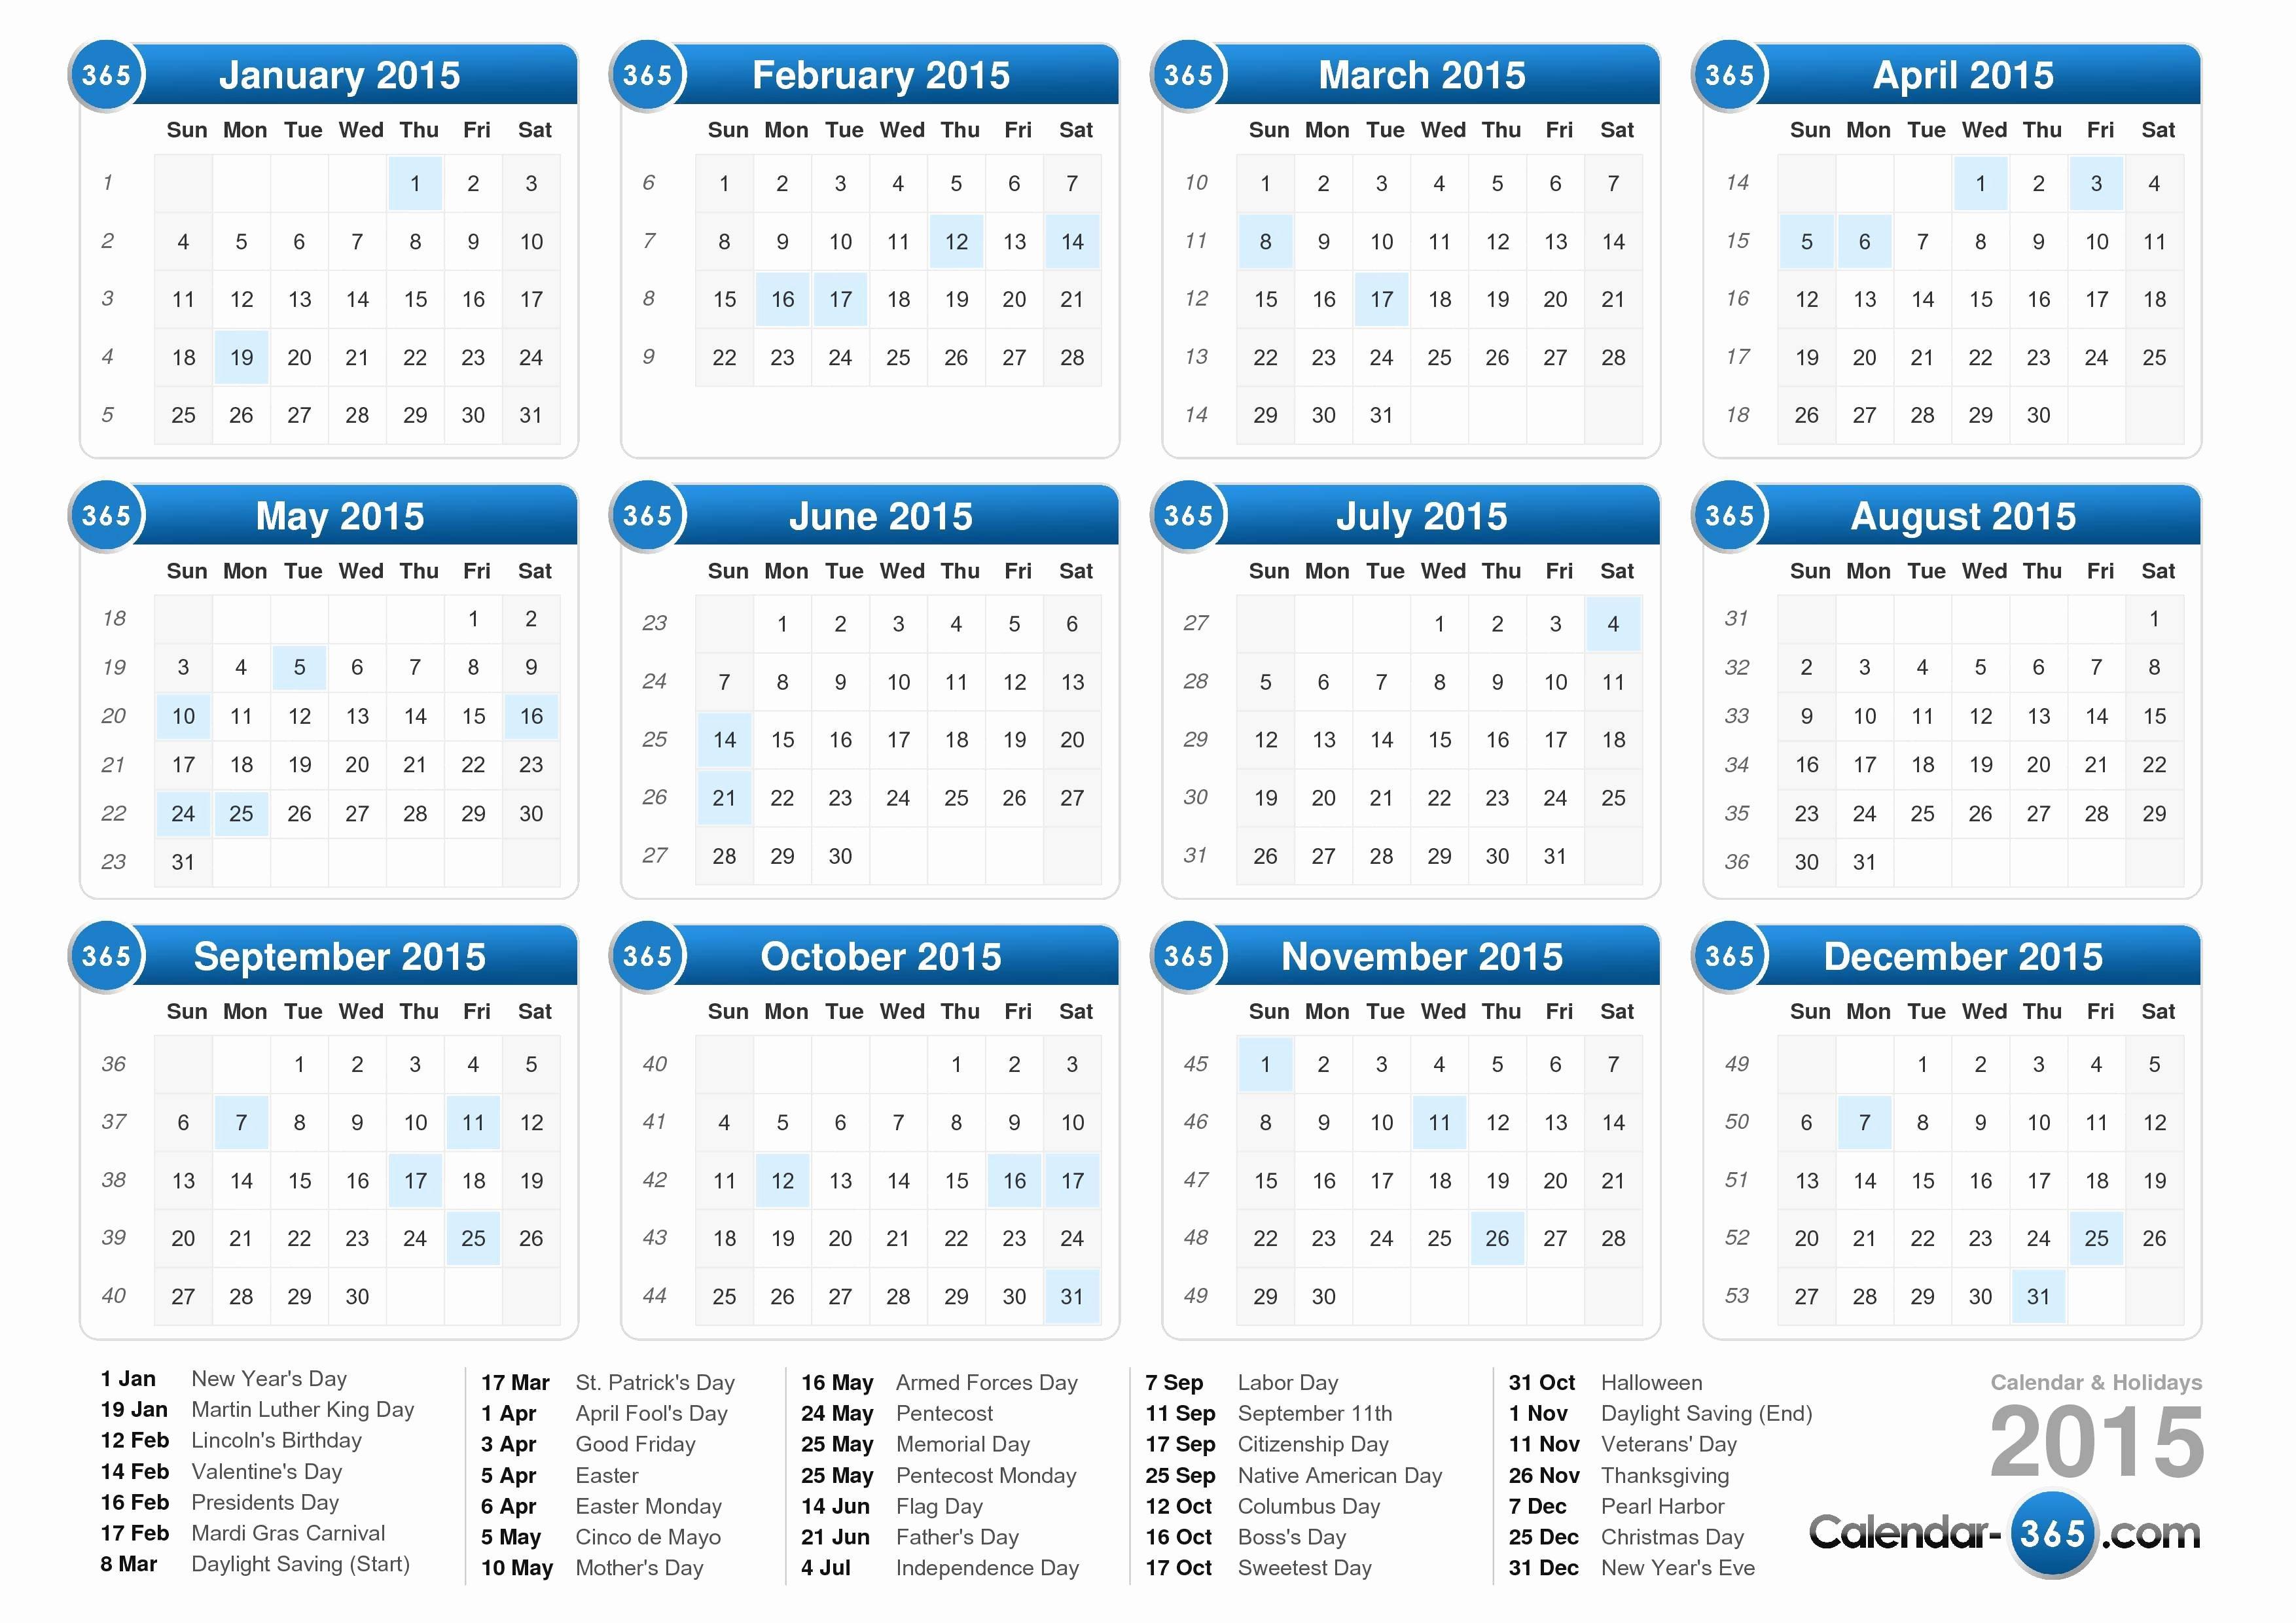 Vacation Calendar Template 2015 Elegant Calendar with Holidays 2015